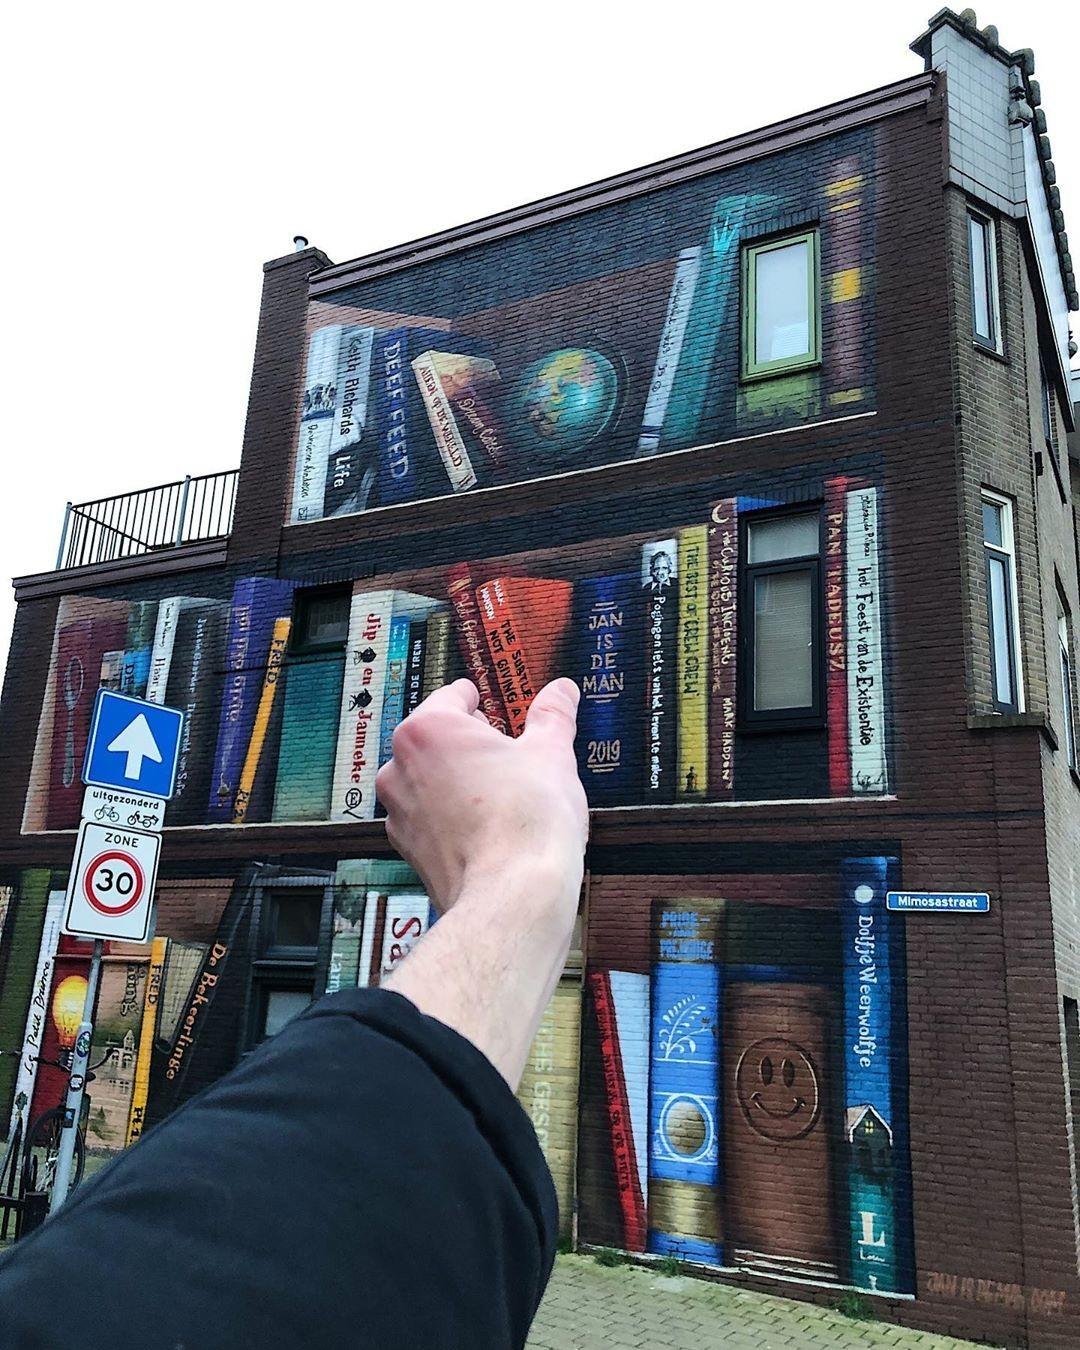 «Выберите книгу» (стрит-арт). Утрехт, Нидерланды. Автор Тиаго Силва